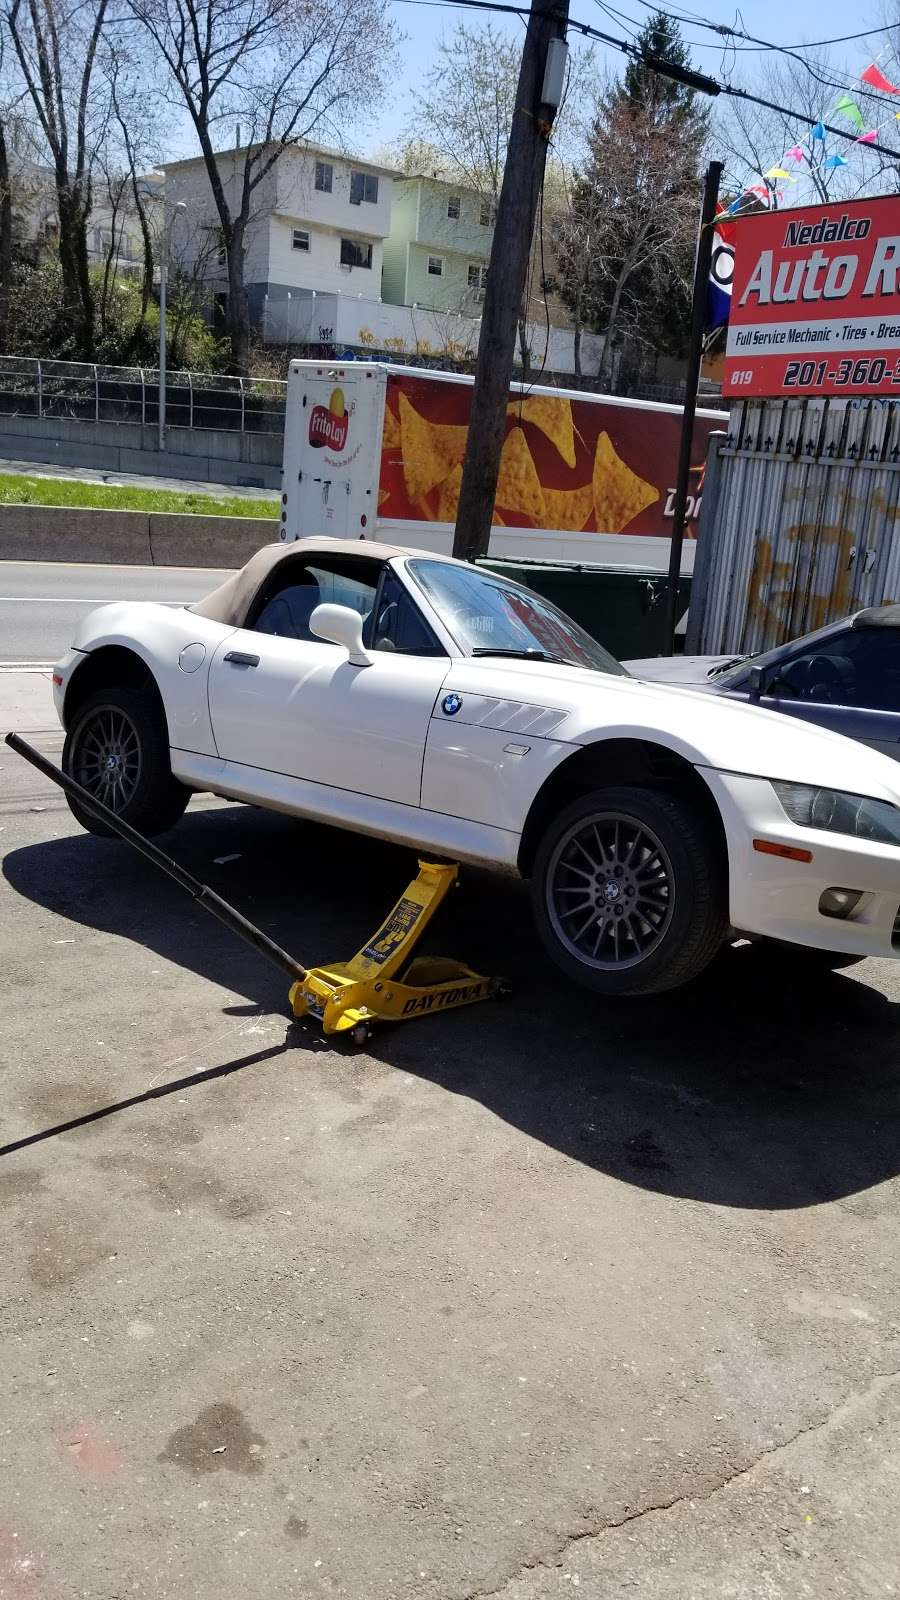 D.A.Autowerks - car repair  | Photo 3 of 10 | Address: 819 Tonnelle Ave, Jersey City, NJ 07307, USA | Phone: (732) 604-2815